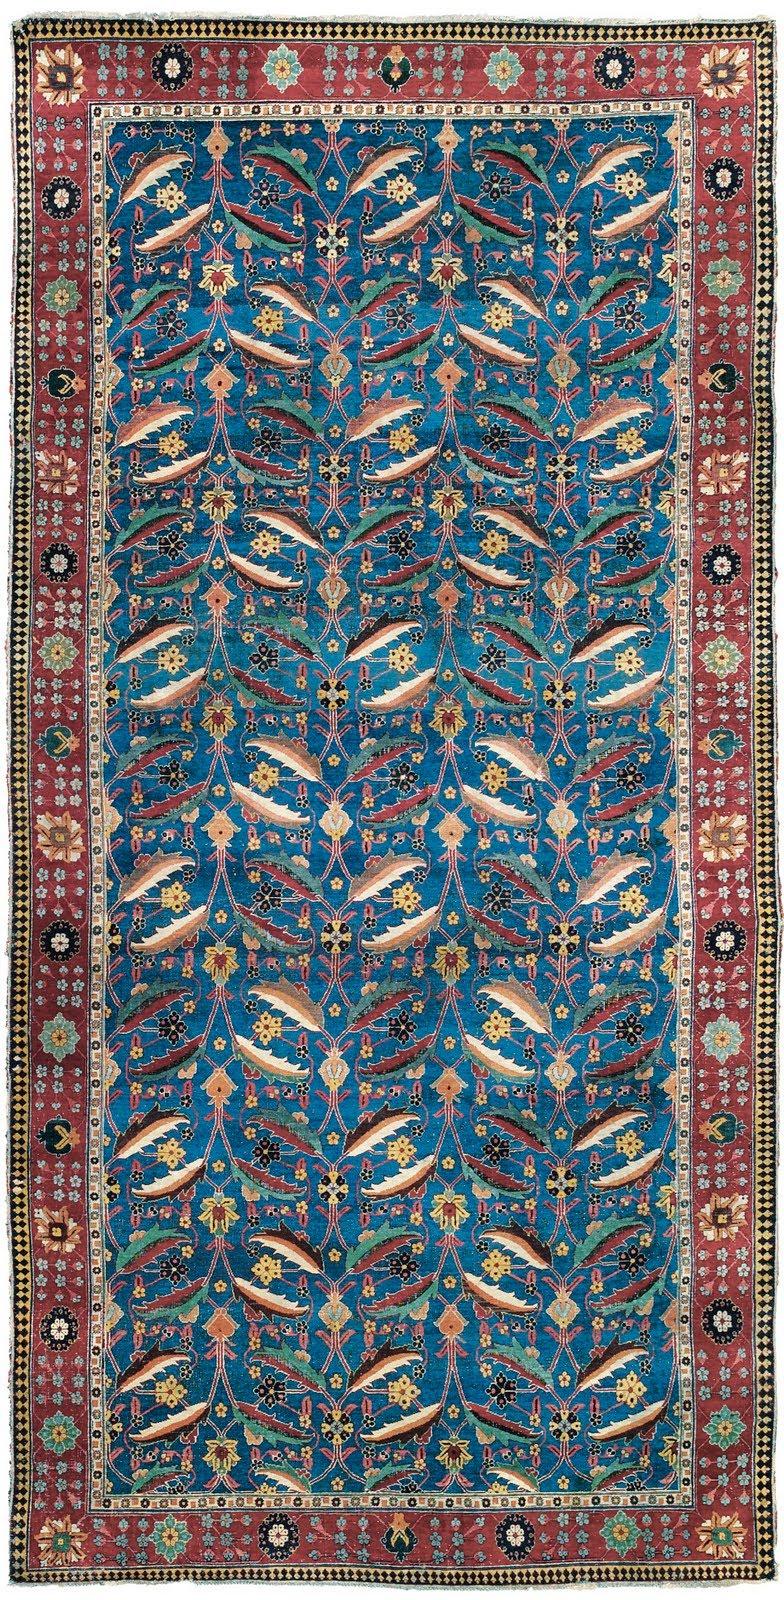 TEA AND CARPETS: Safavid Floral and Polonaise Carpets ...